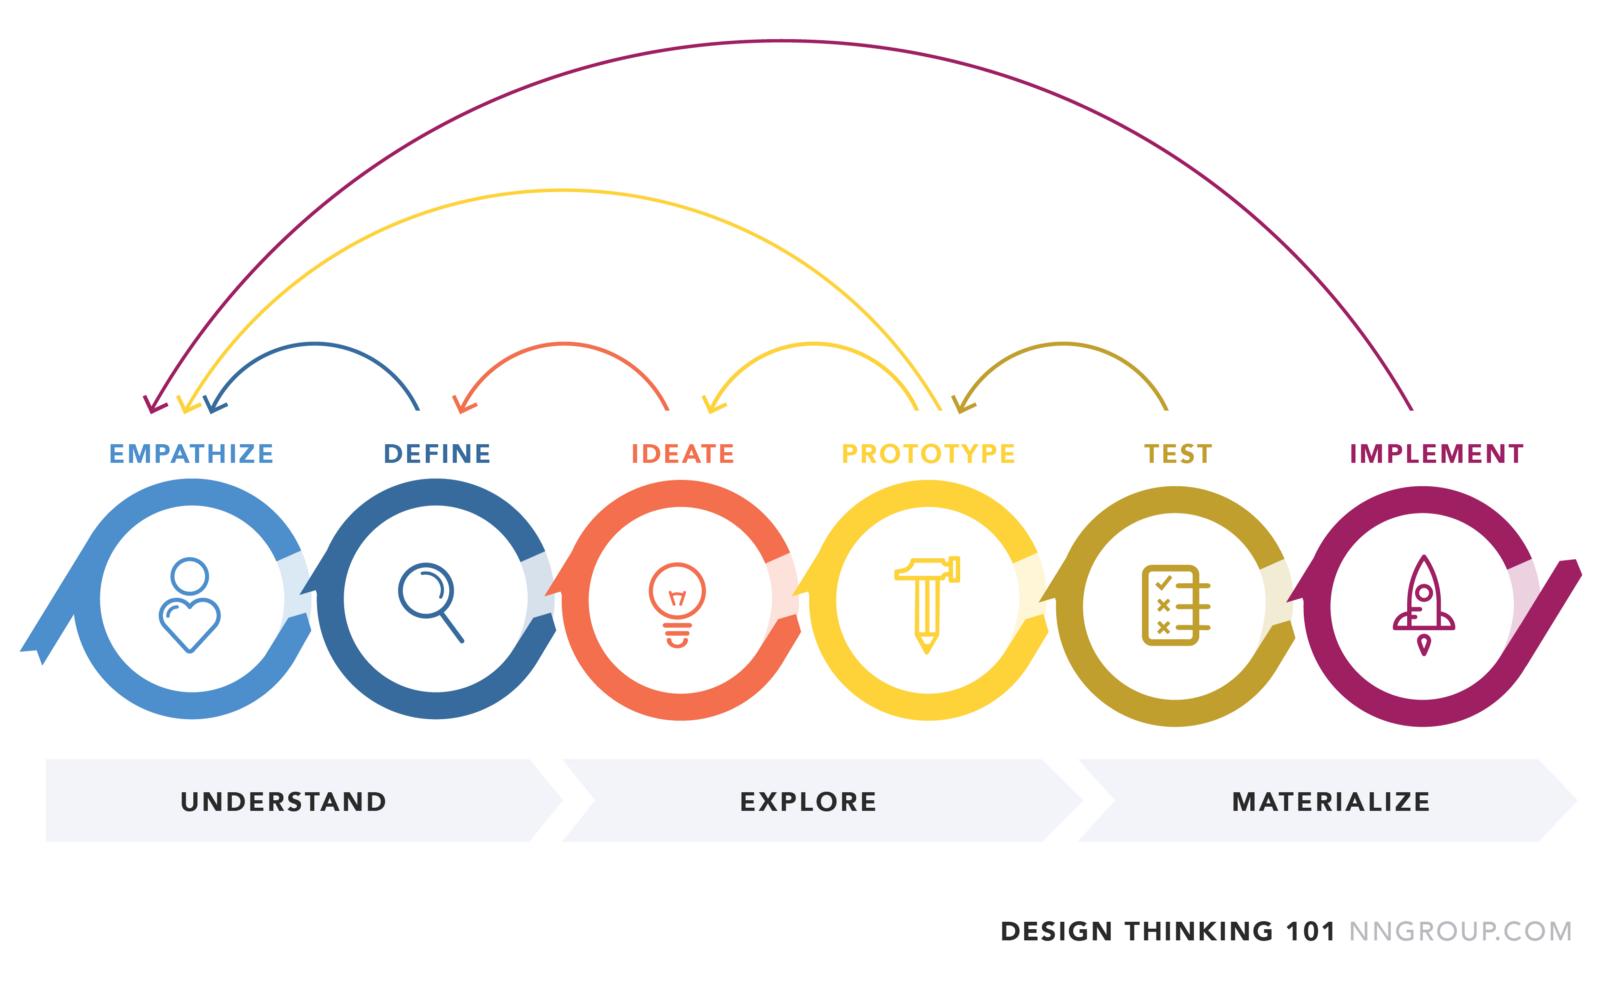 Professor Michael Roberto's Blog: IDEO's Response to Criticism of ...